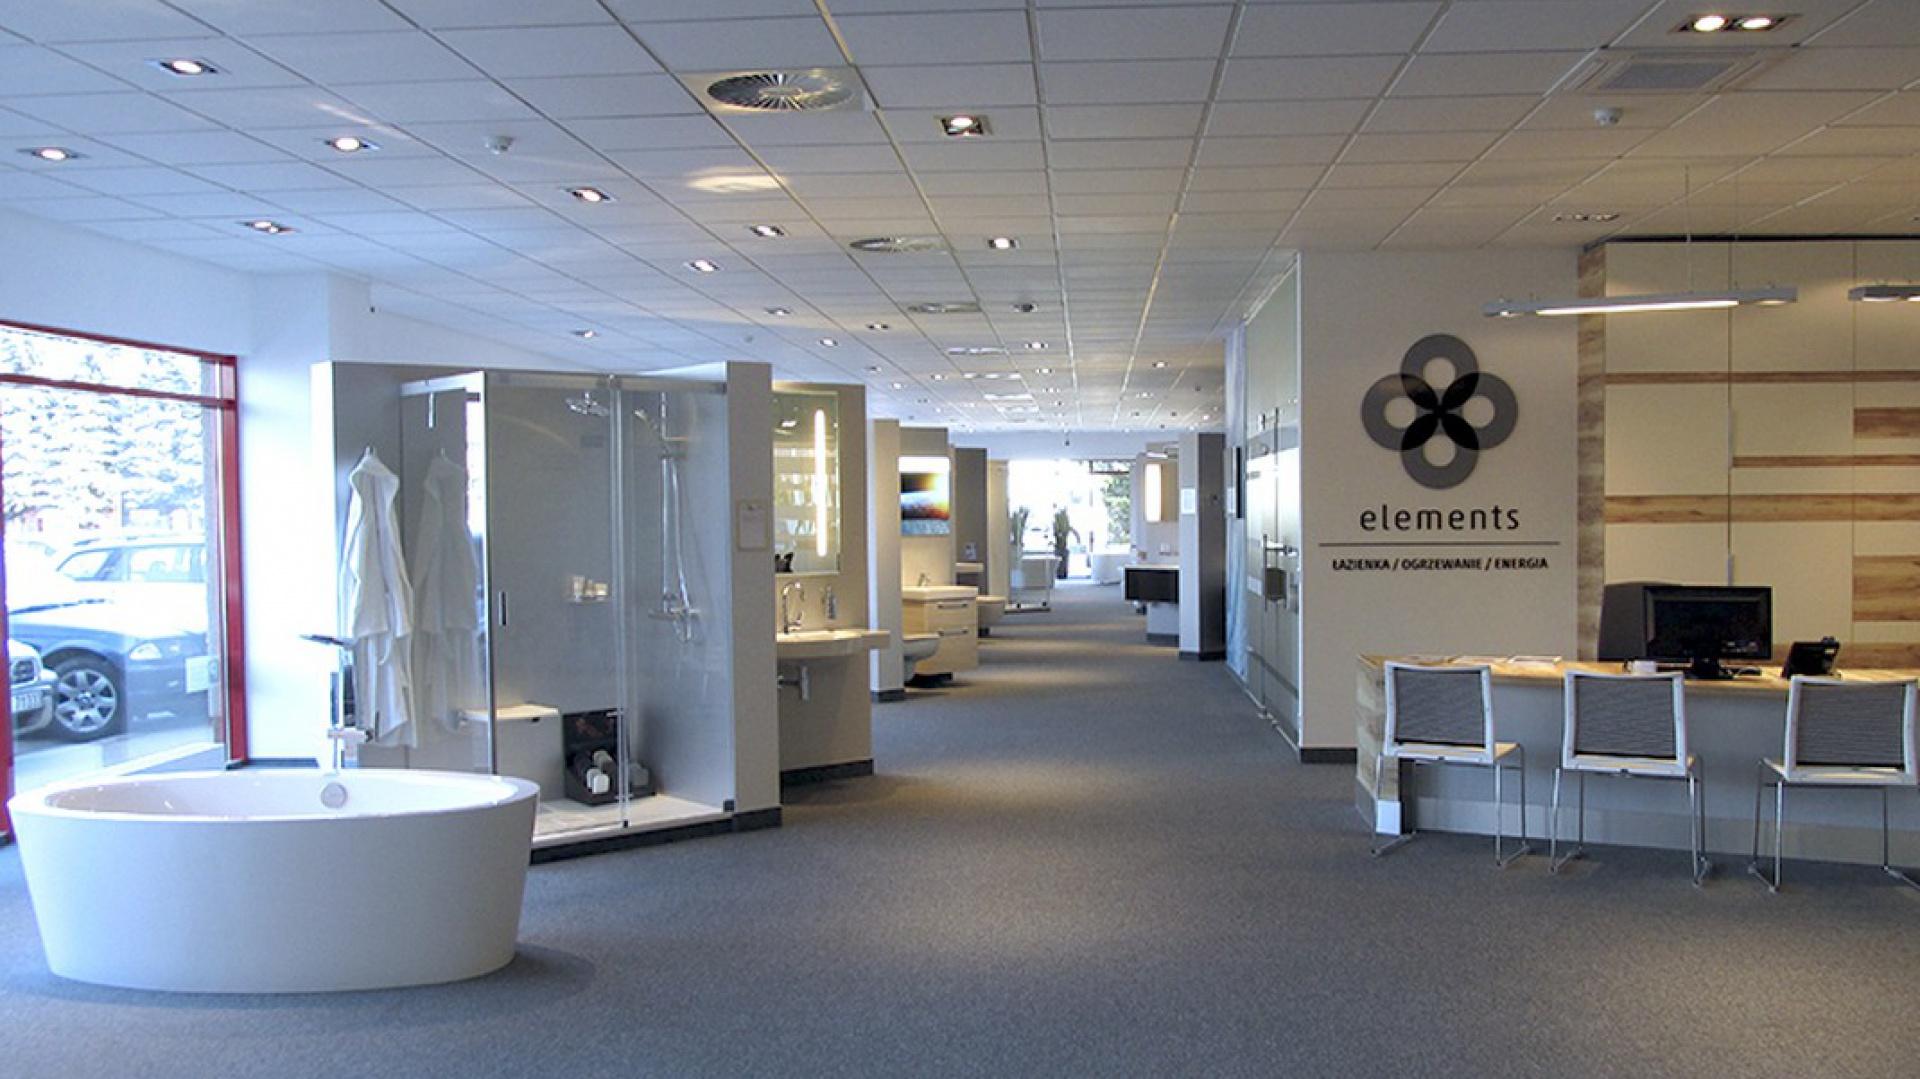 Nowoczesne wnętrze salonu Elements. Fot. Elements